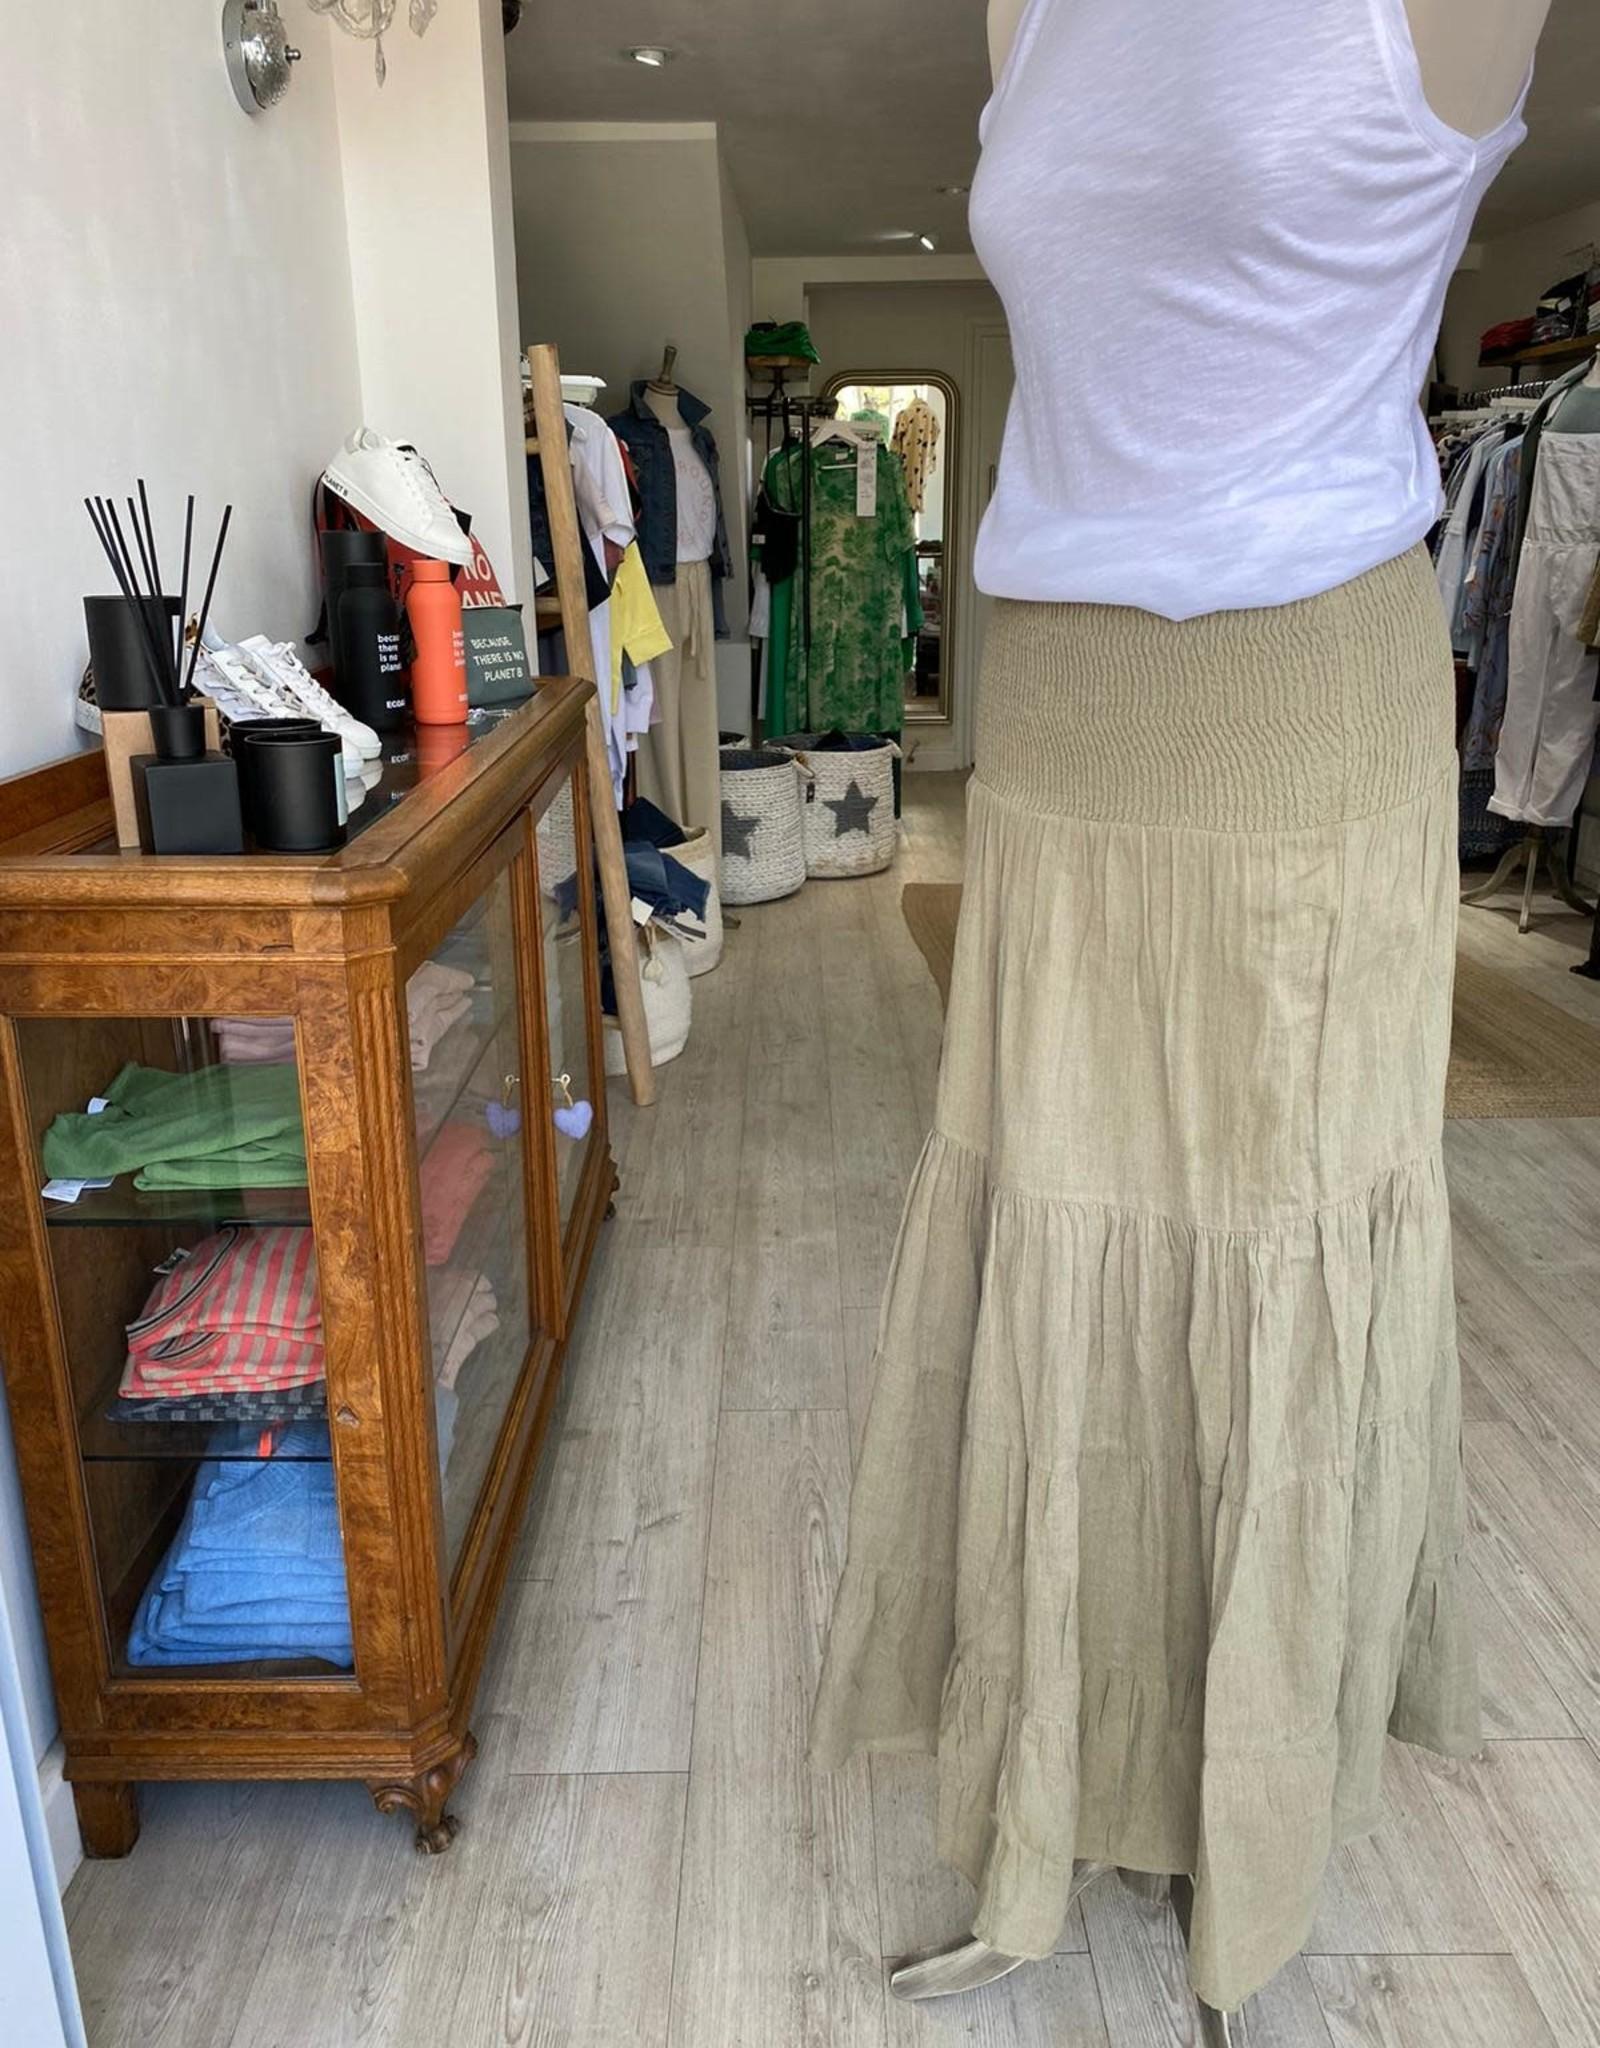 SAINT TROPEZ NAYA CHEESECLOTH SKIRT / DRESS SAINT TROPEZ